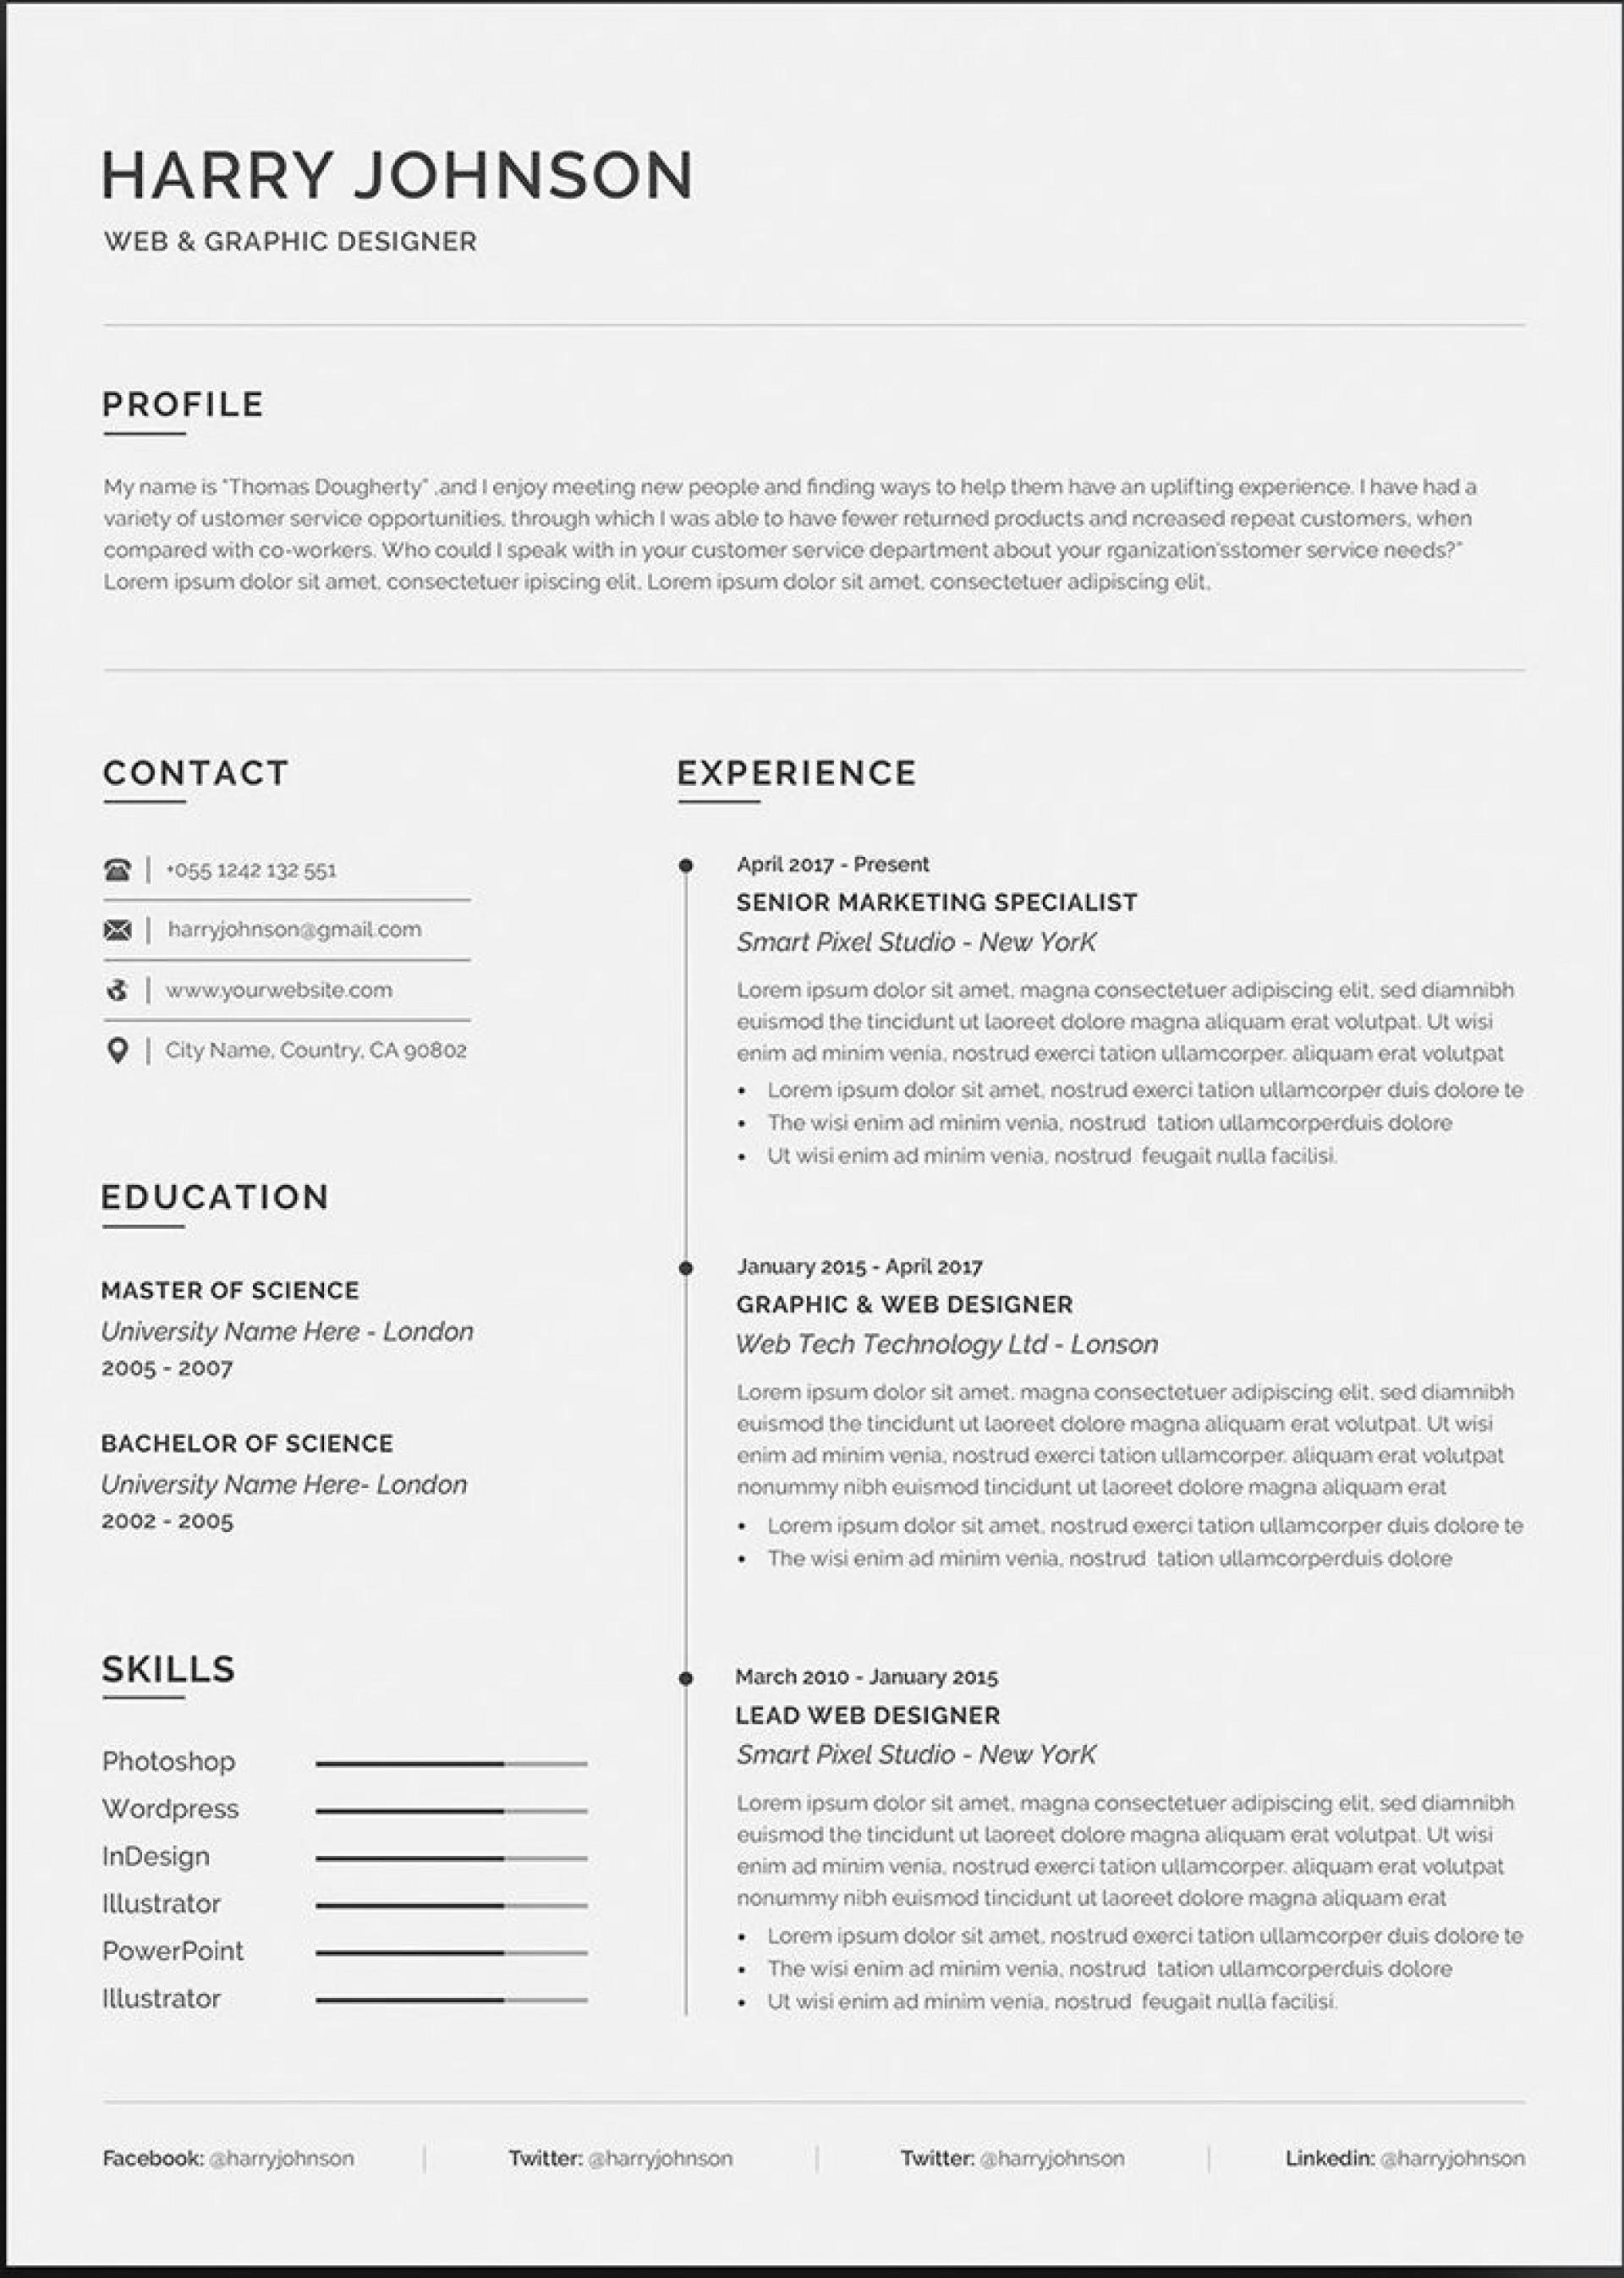 004 Amazing Microsoft Word Resume Template High Resolution  Reddit 2019 2010 Free Download1920